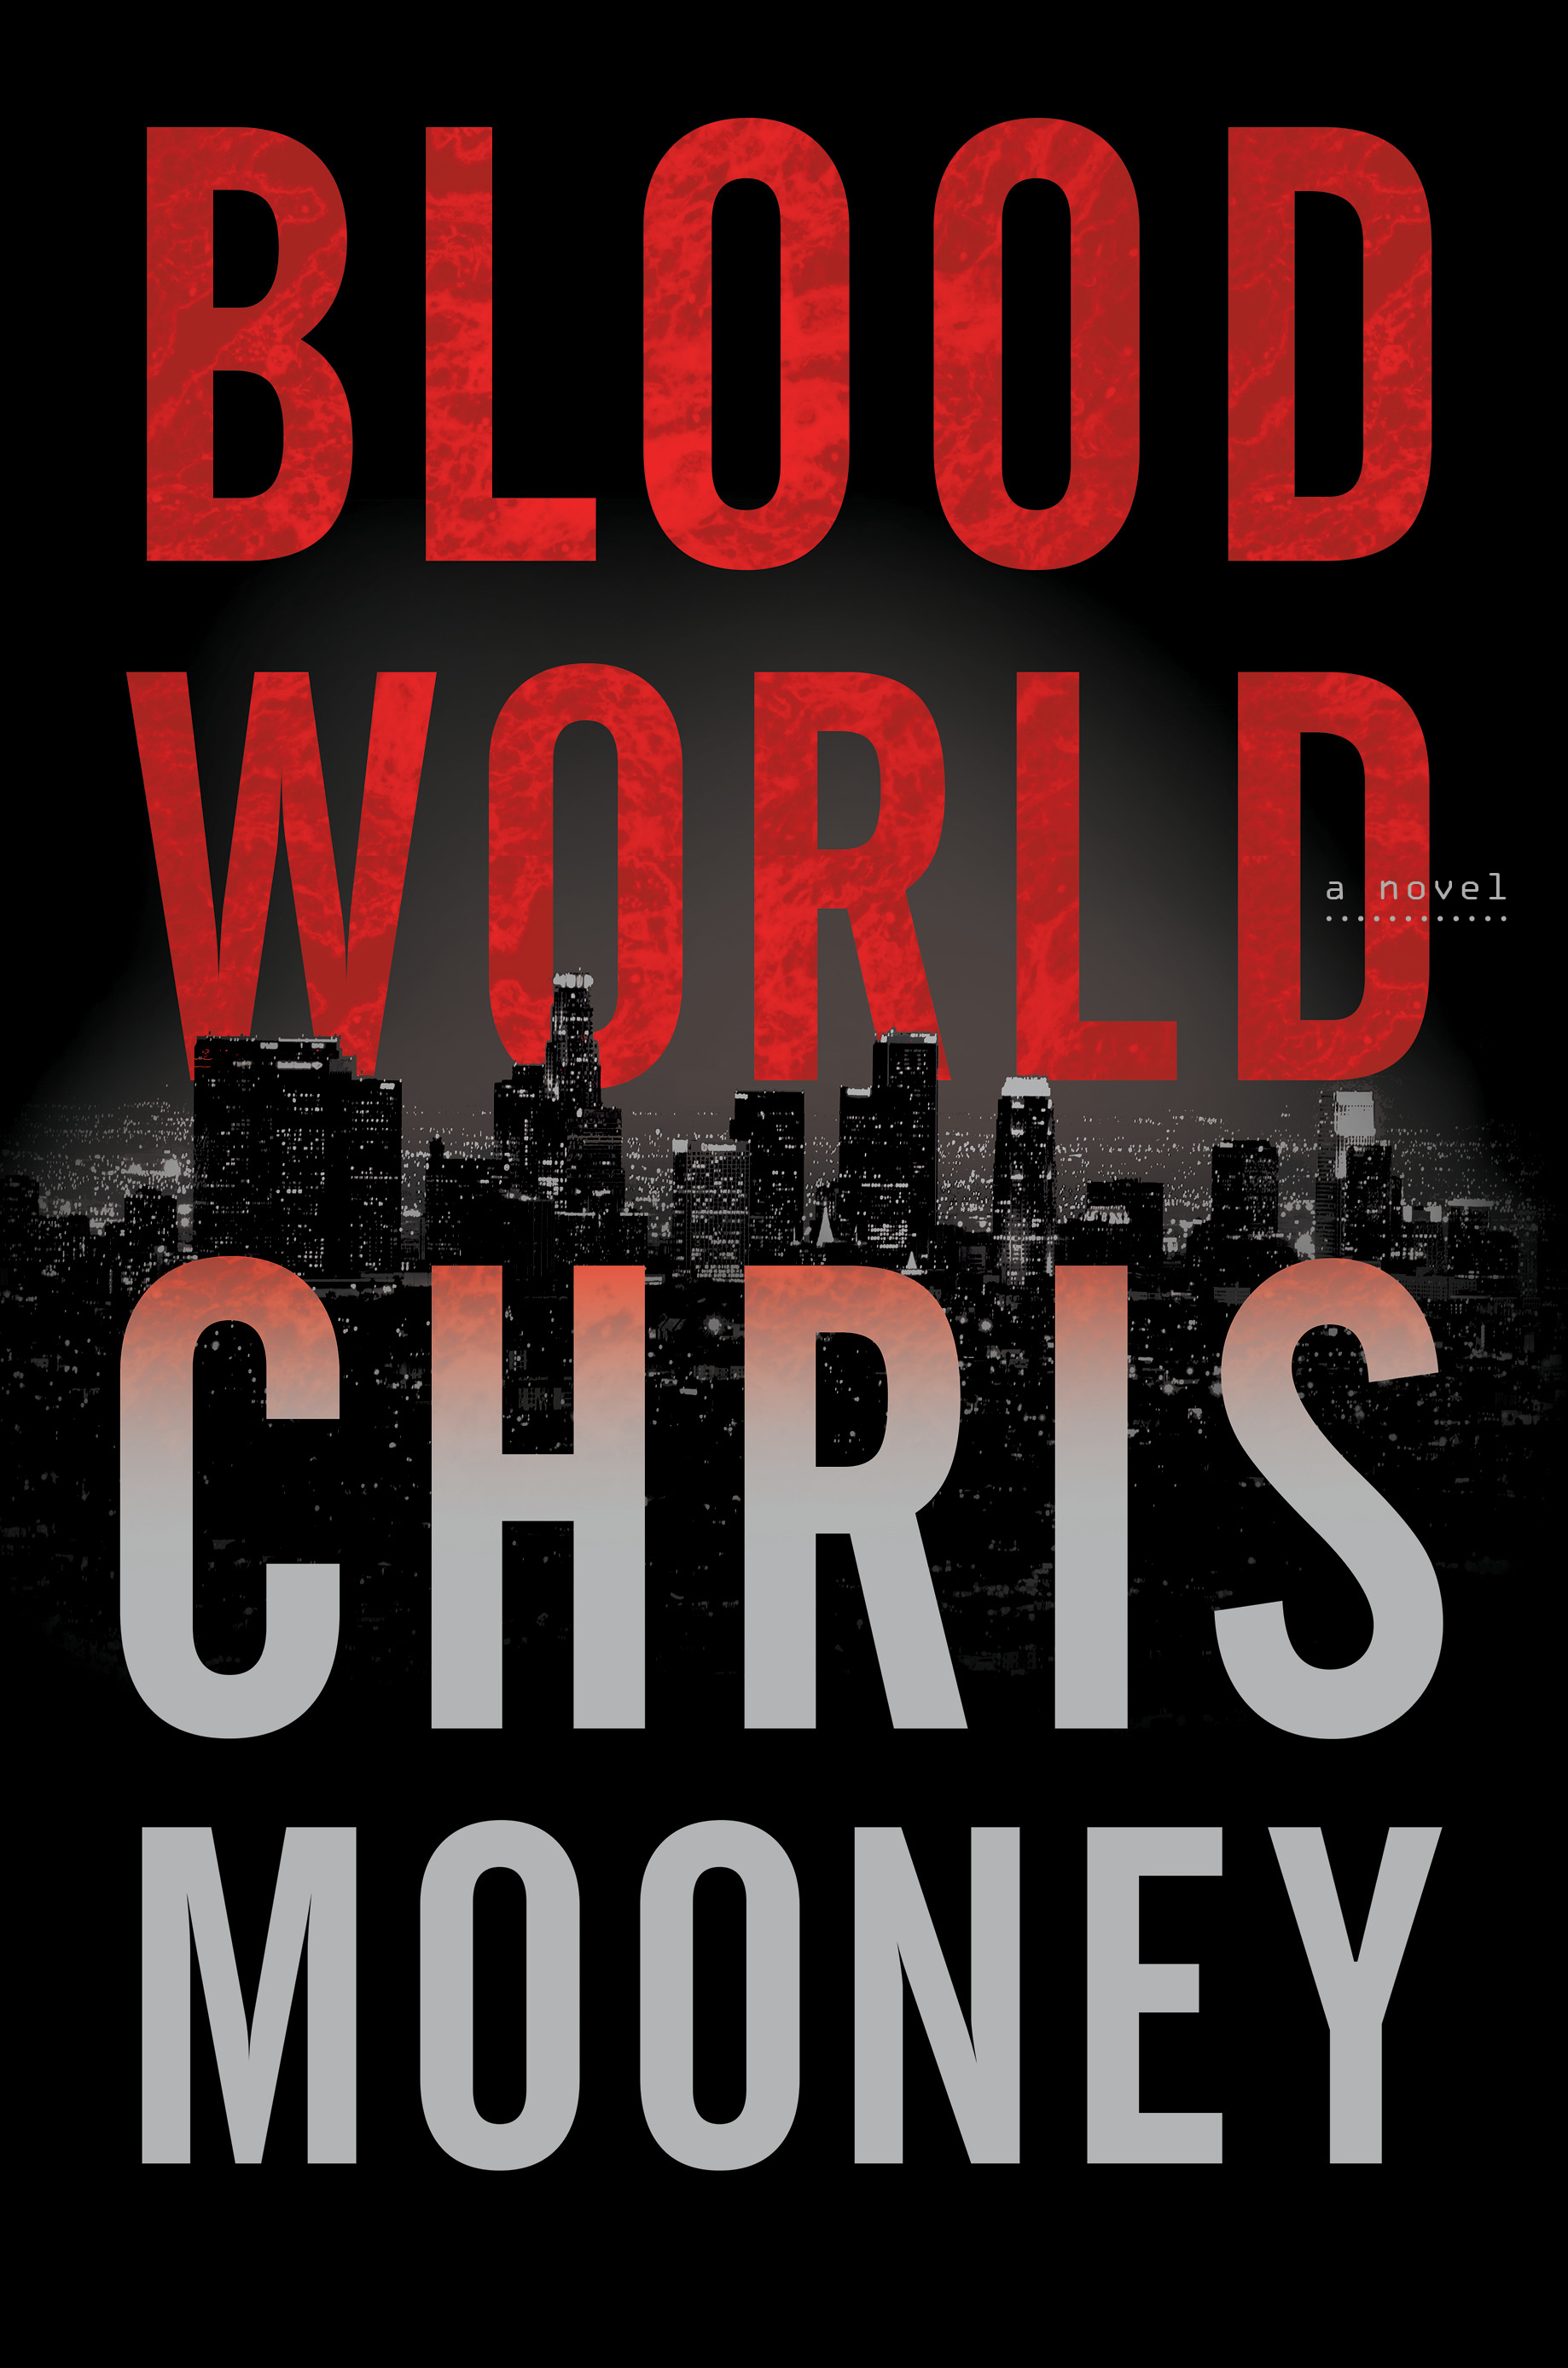 Blood WorldbyChris Mooney